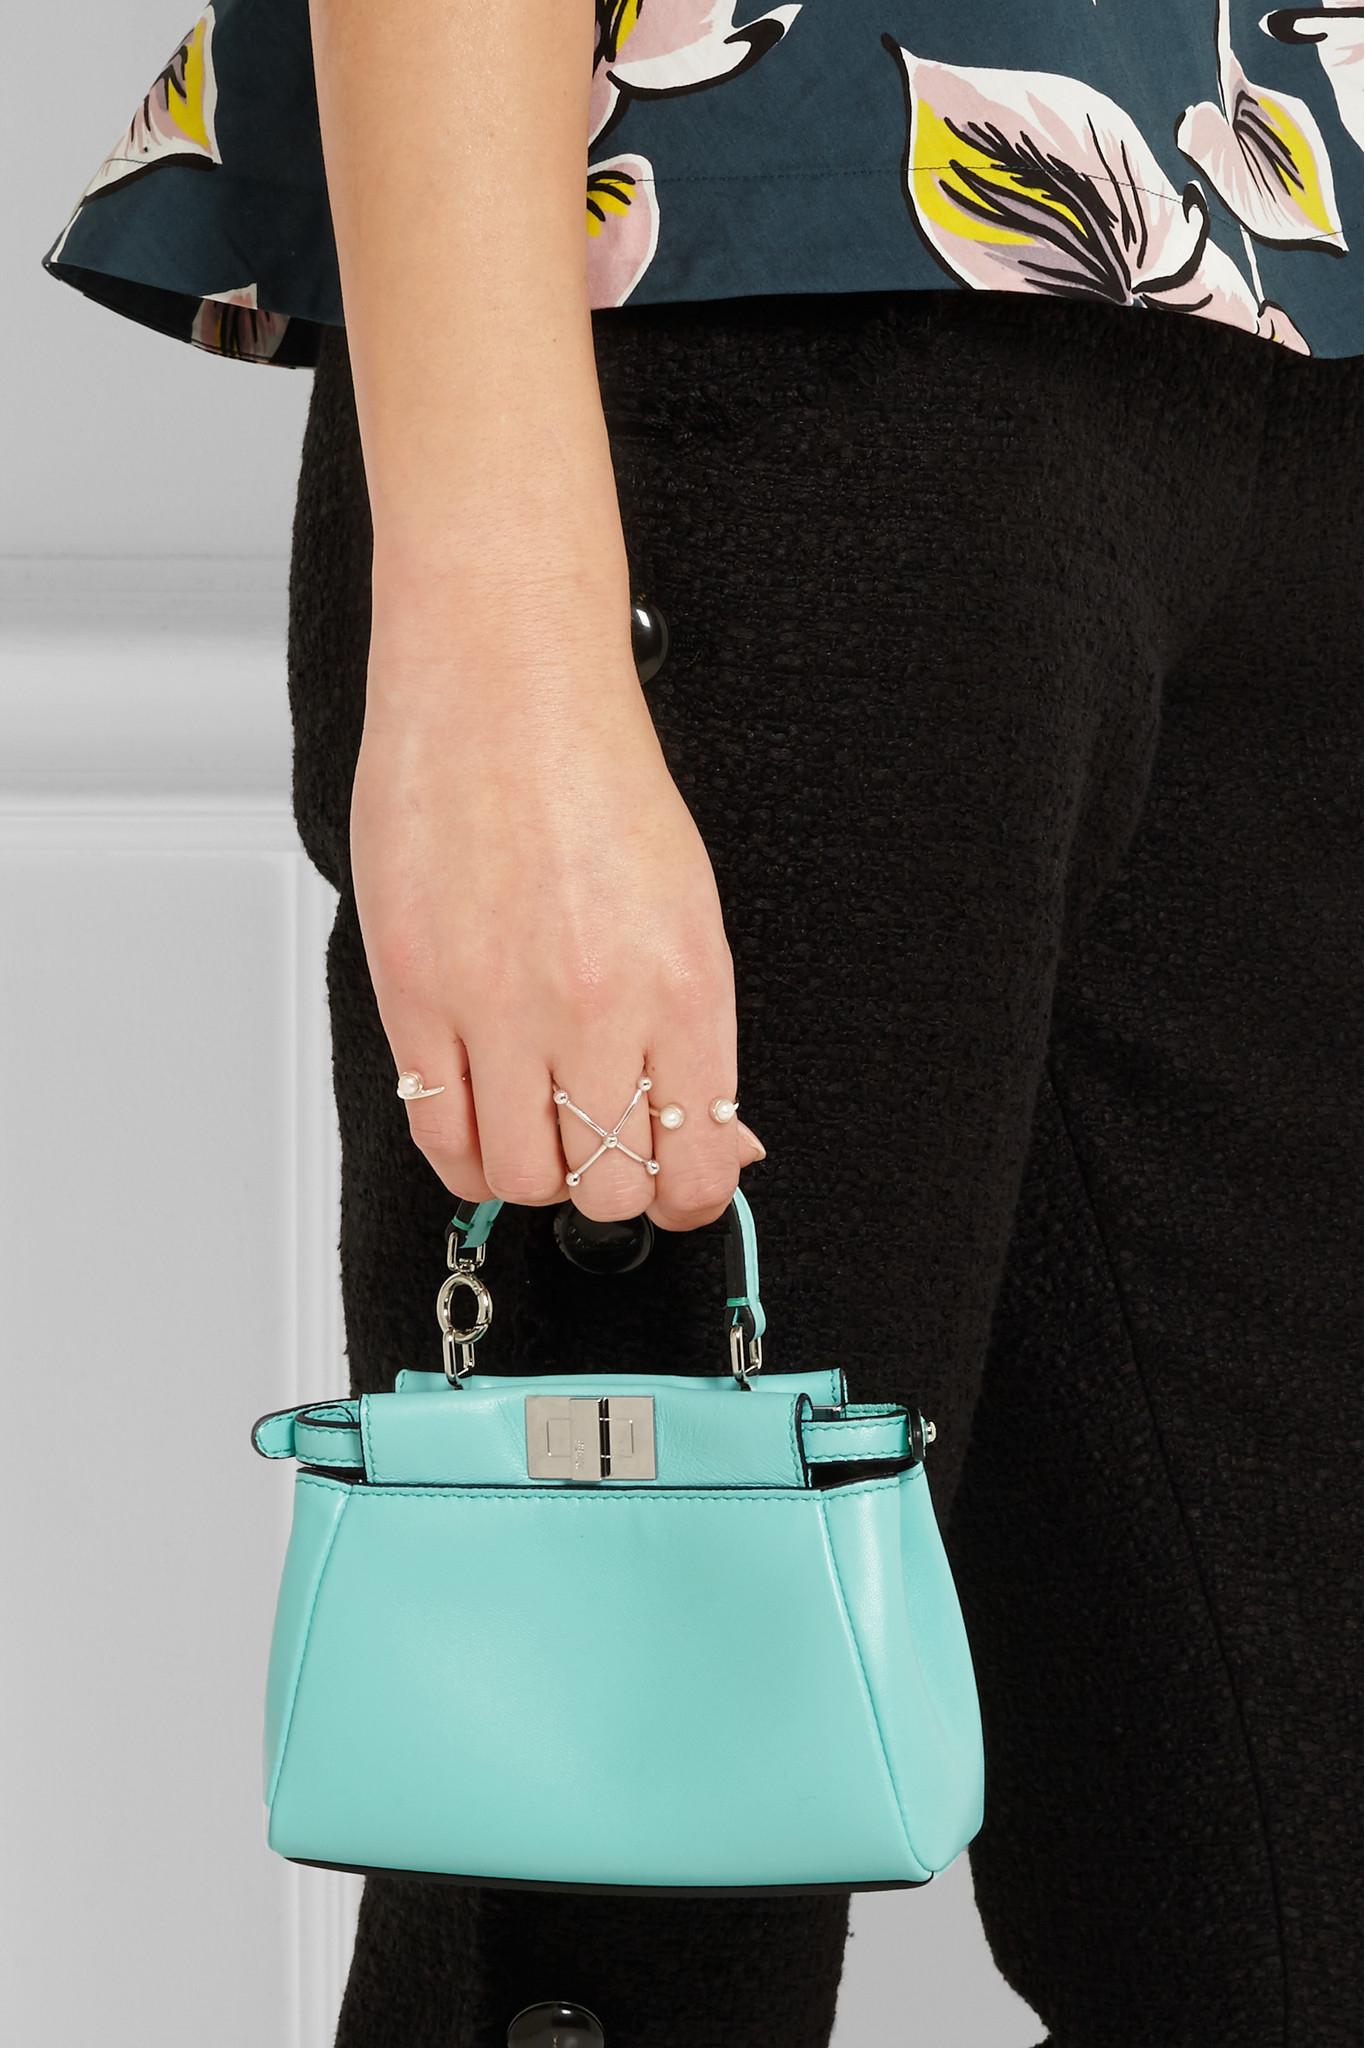 c88a7a2de84f ... discount code for fendi peekaboo micro leather shoulder bag in blue lyst  13834 59b32